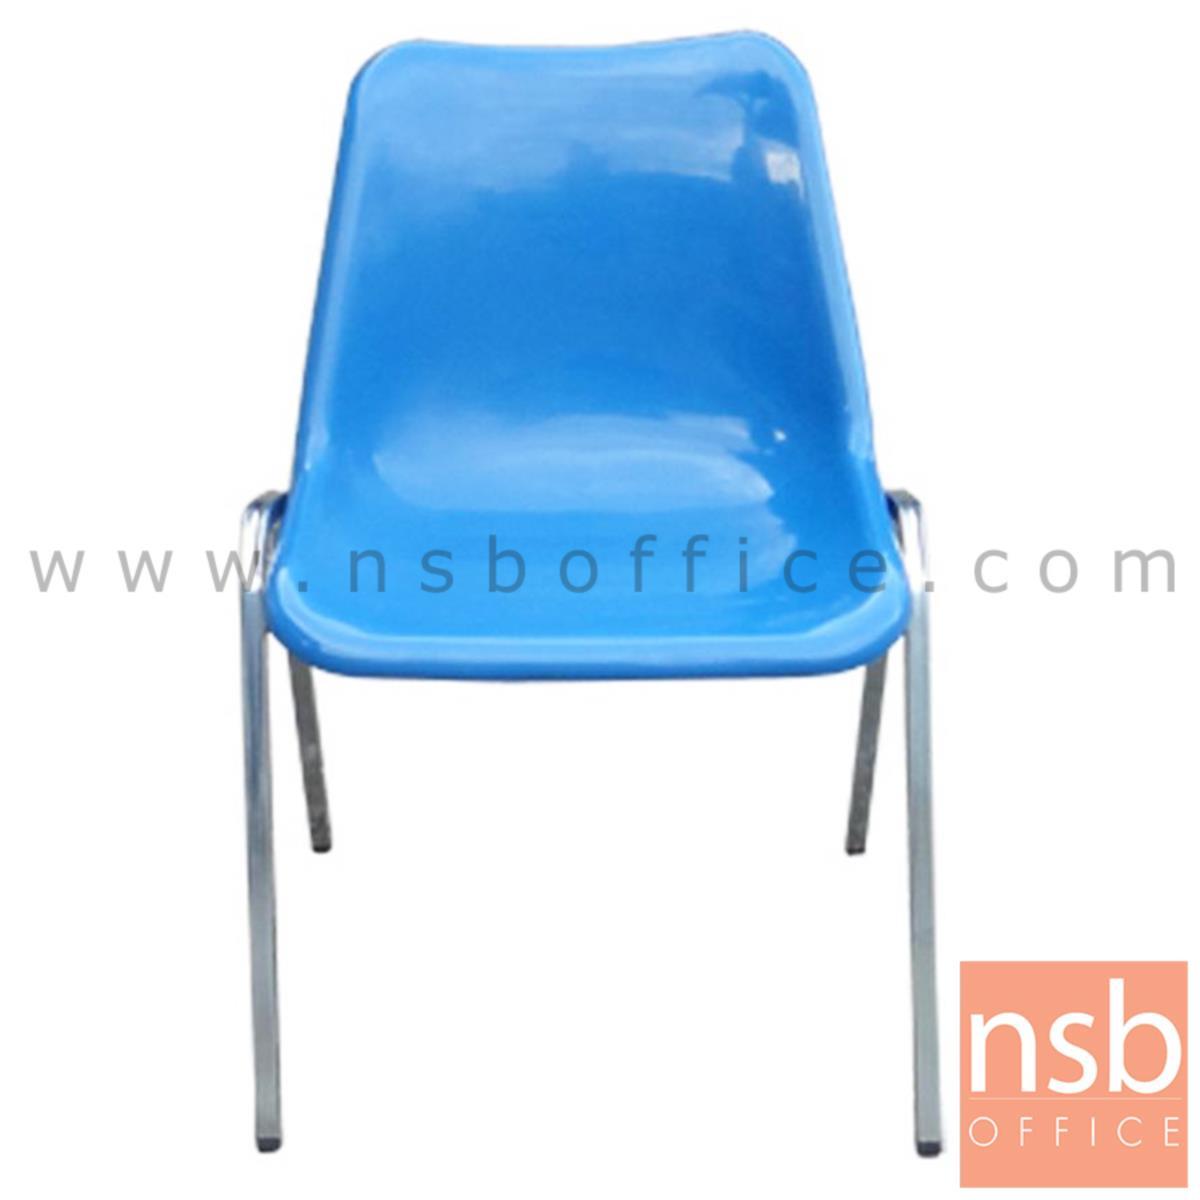 B05A081:เก้าอี้อเนกประสงค์เฟรมโพลี่  รุ่น TY-CP02P ขาเหล็ก